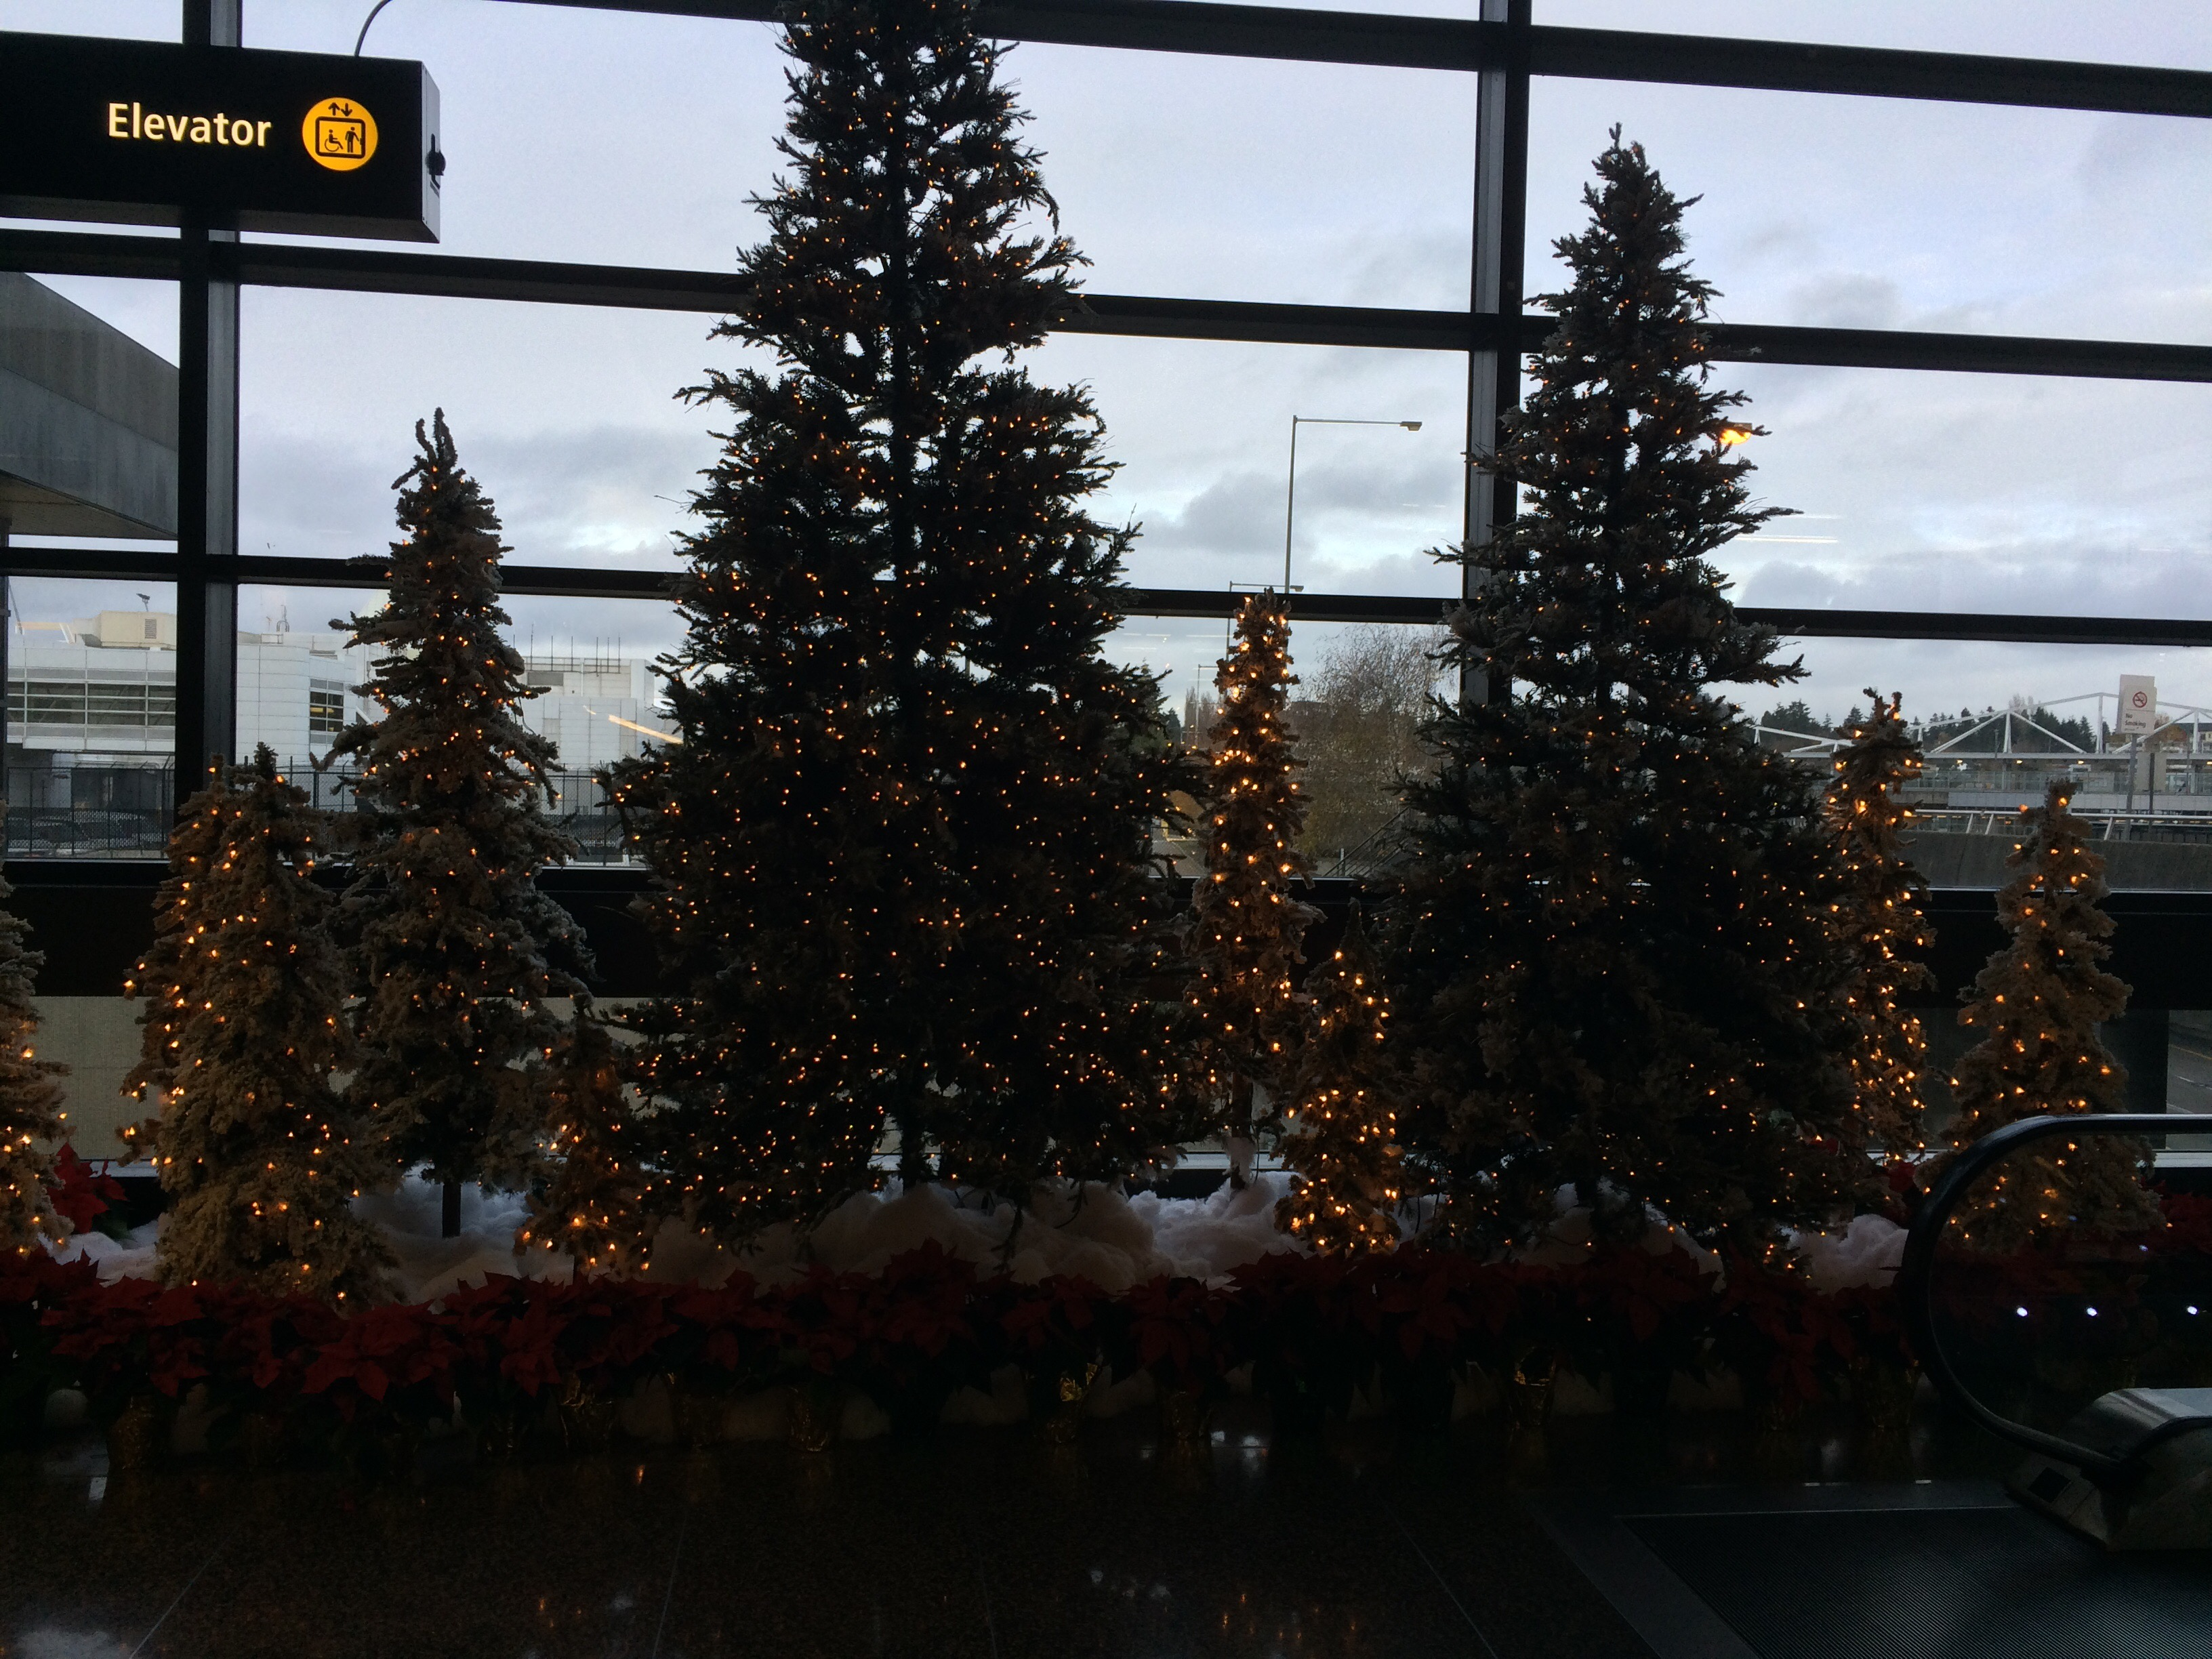 Seatac Airport Christmas Trees A Very Atheist Christmas